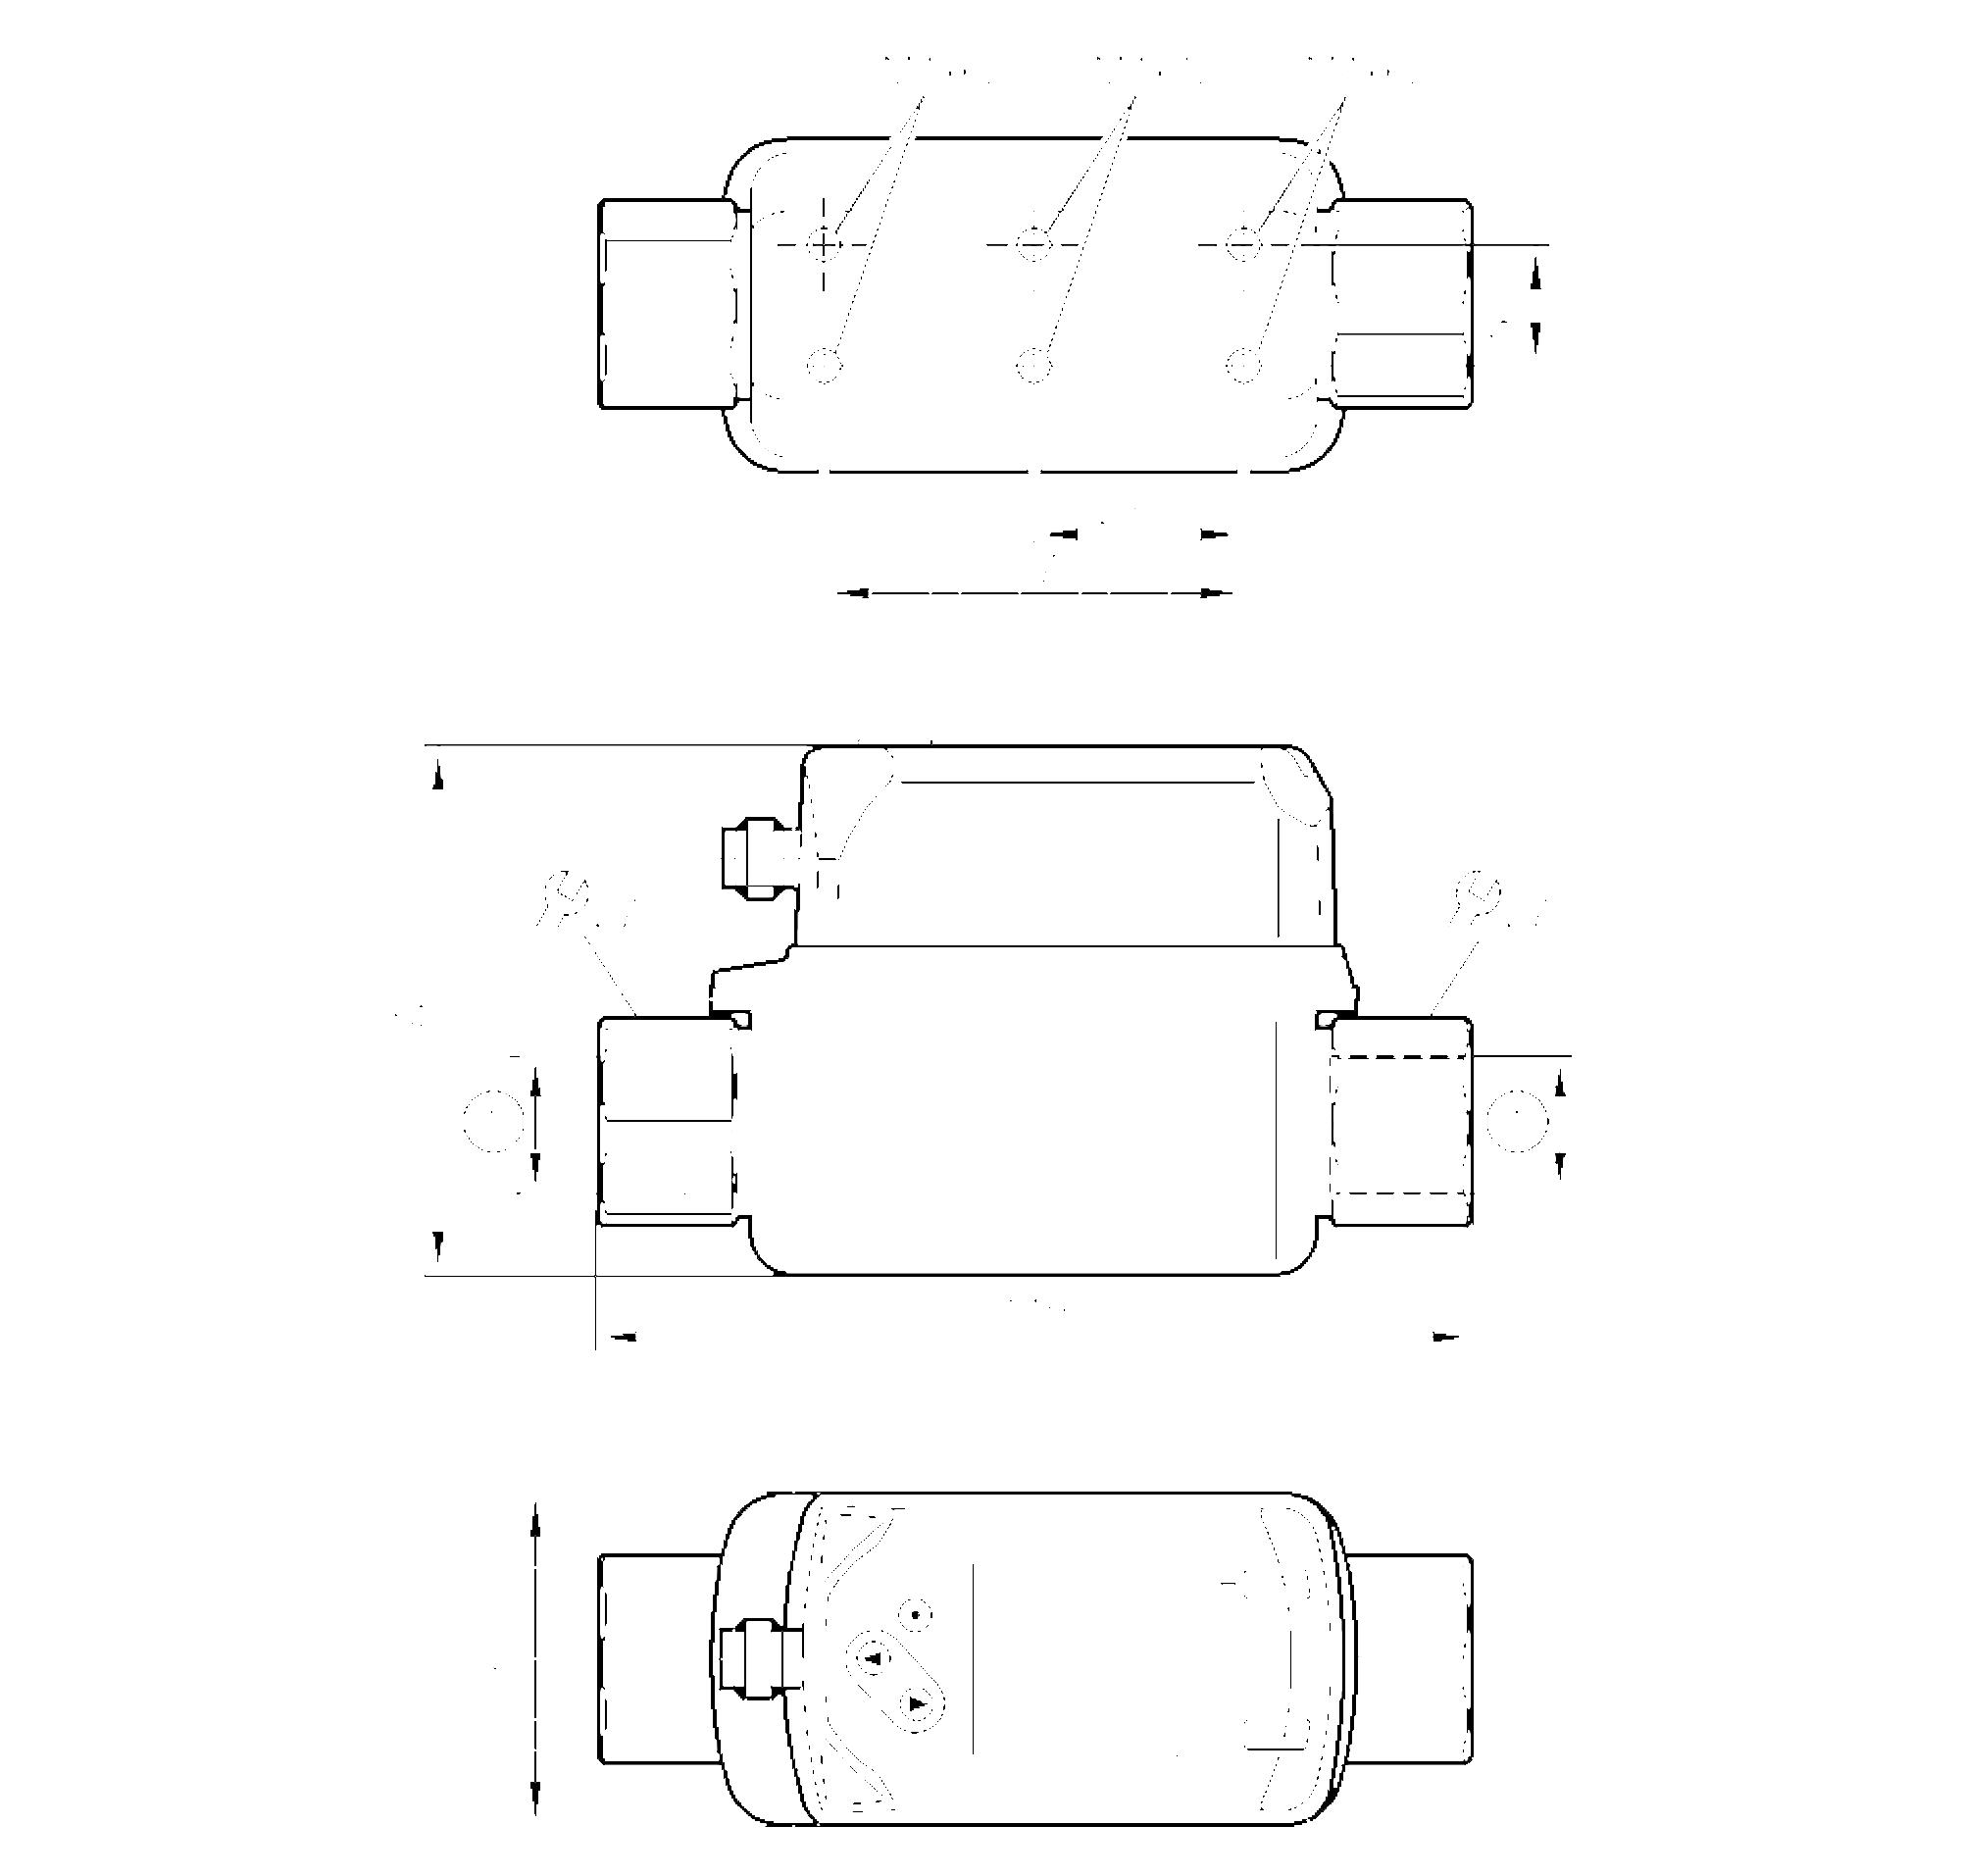 sv5610